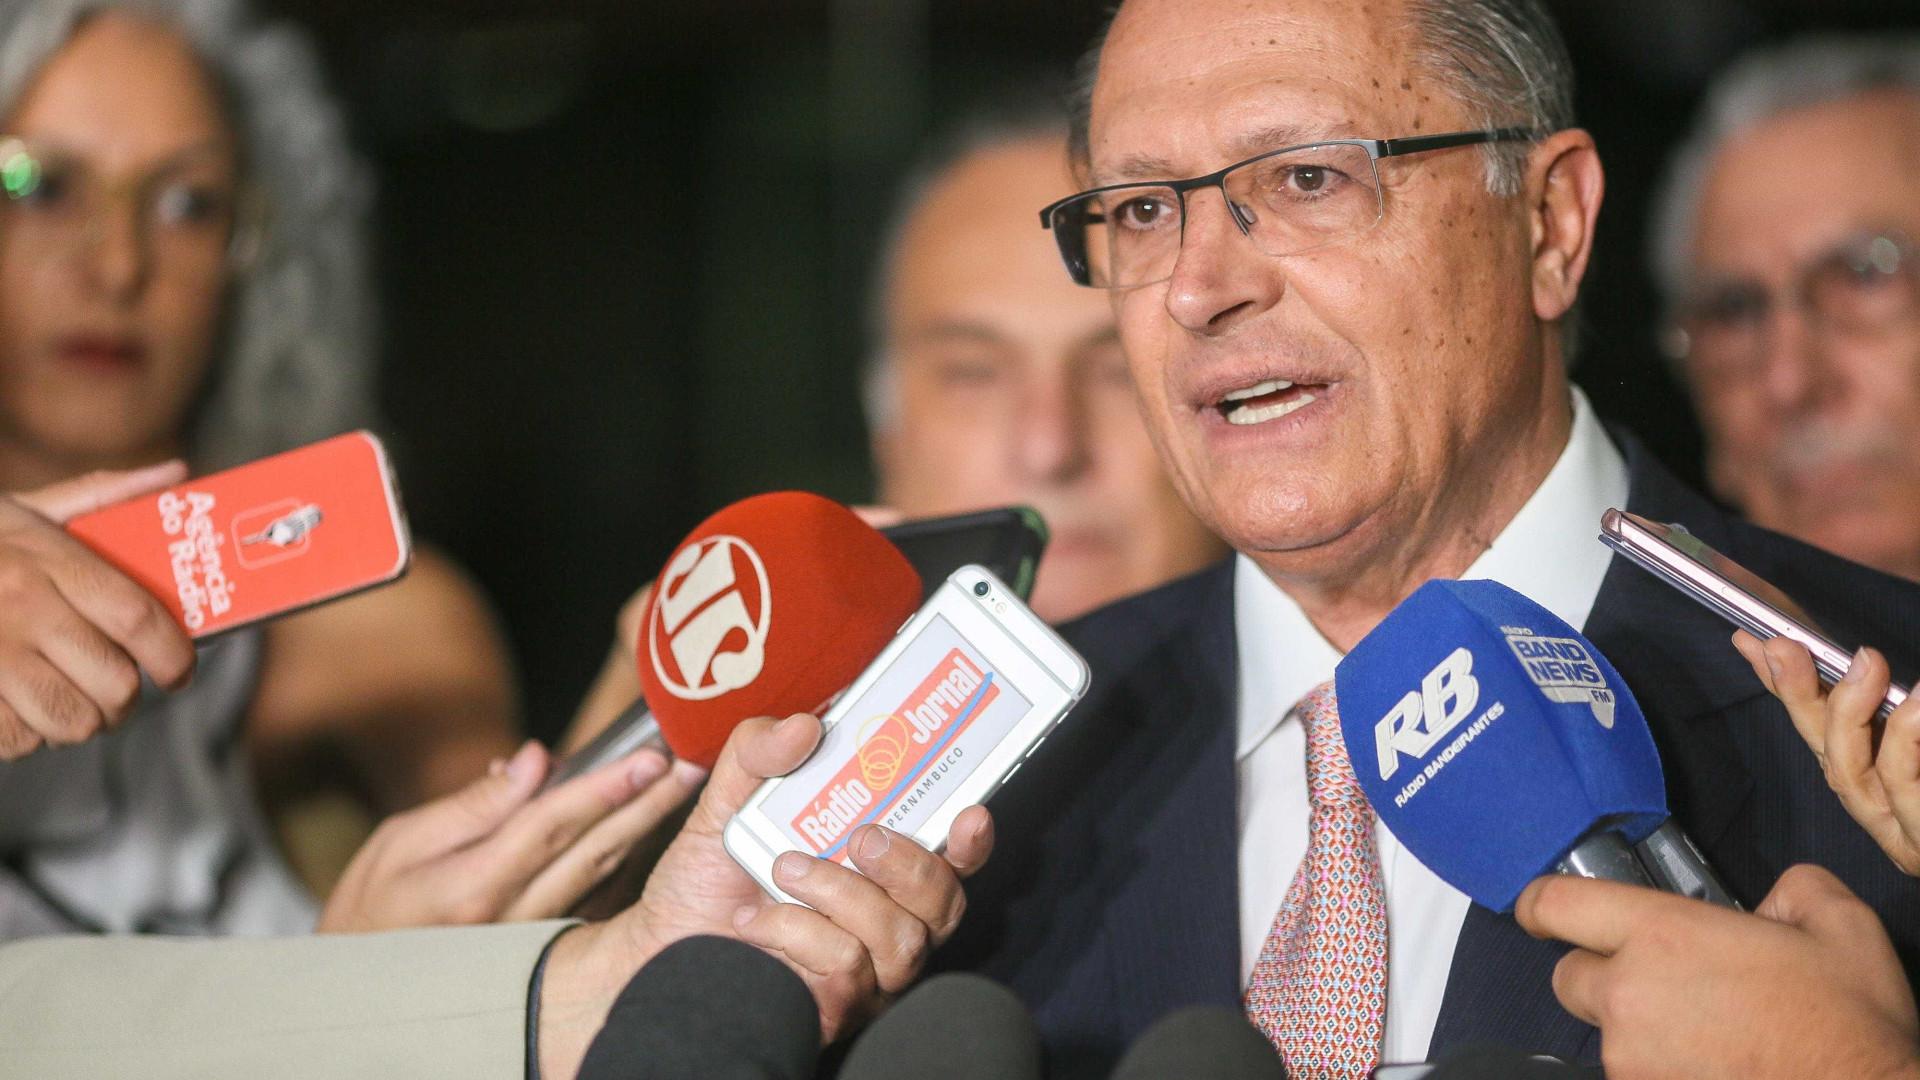 'Cabeça preta' declara apoio a Alckmin e tenta aproximá-lo do MBL